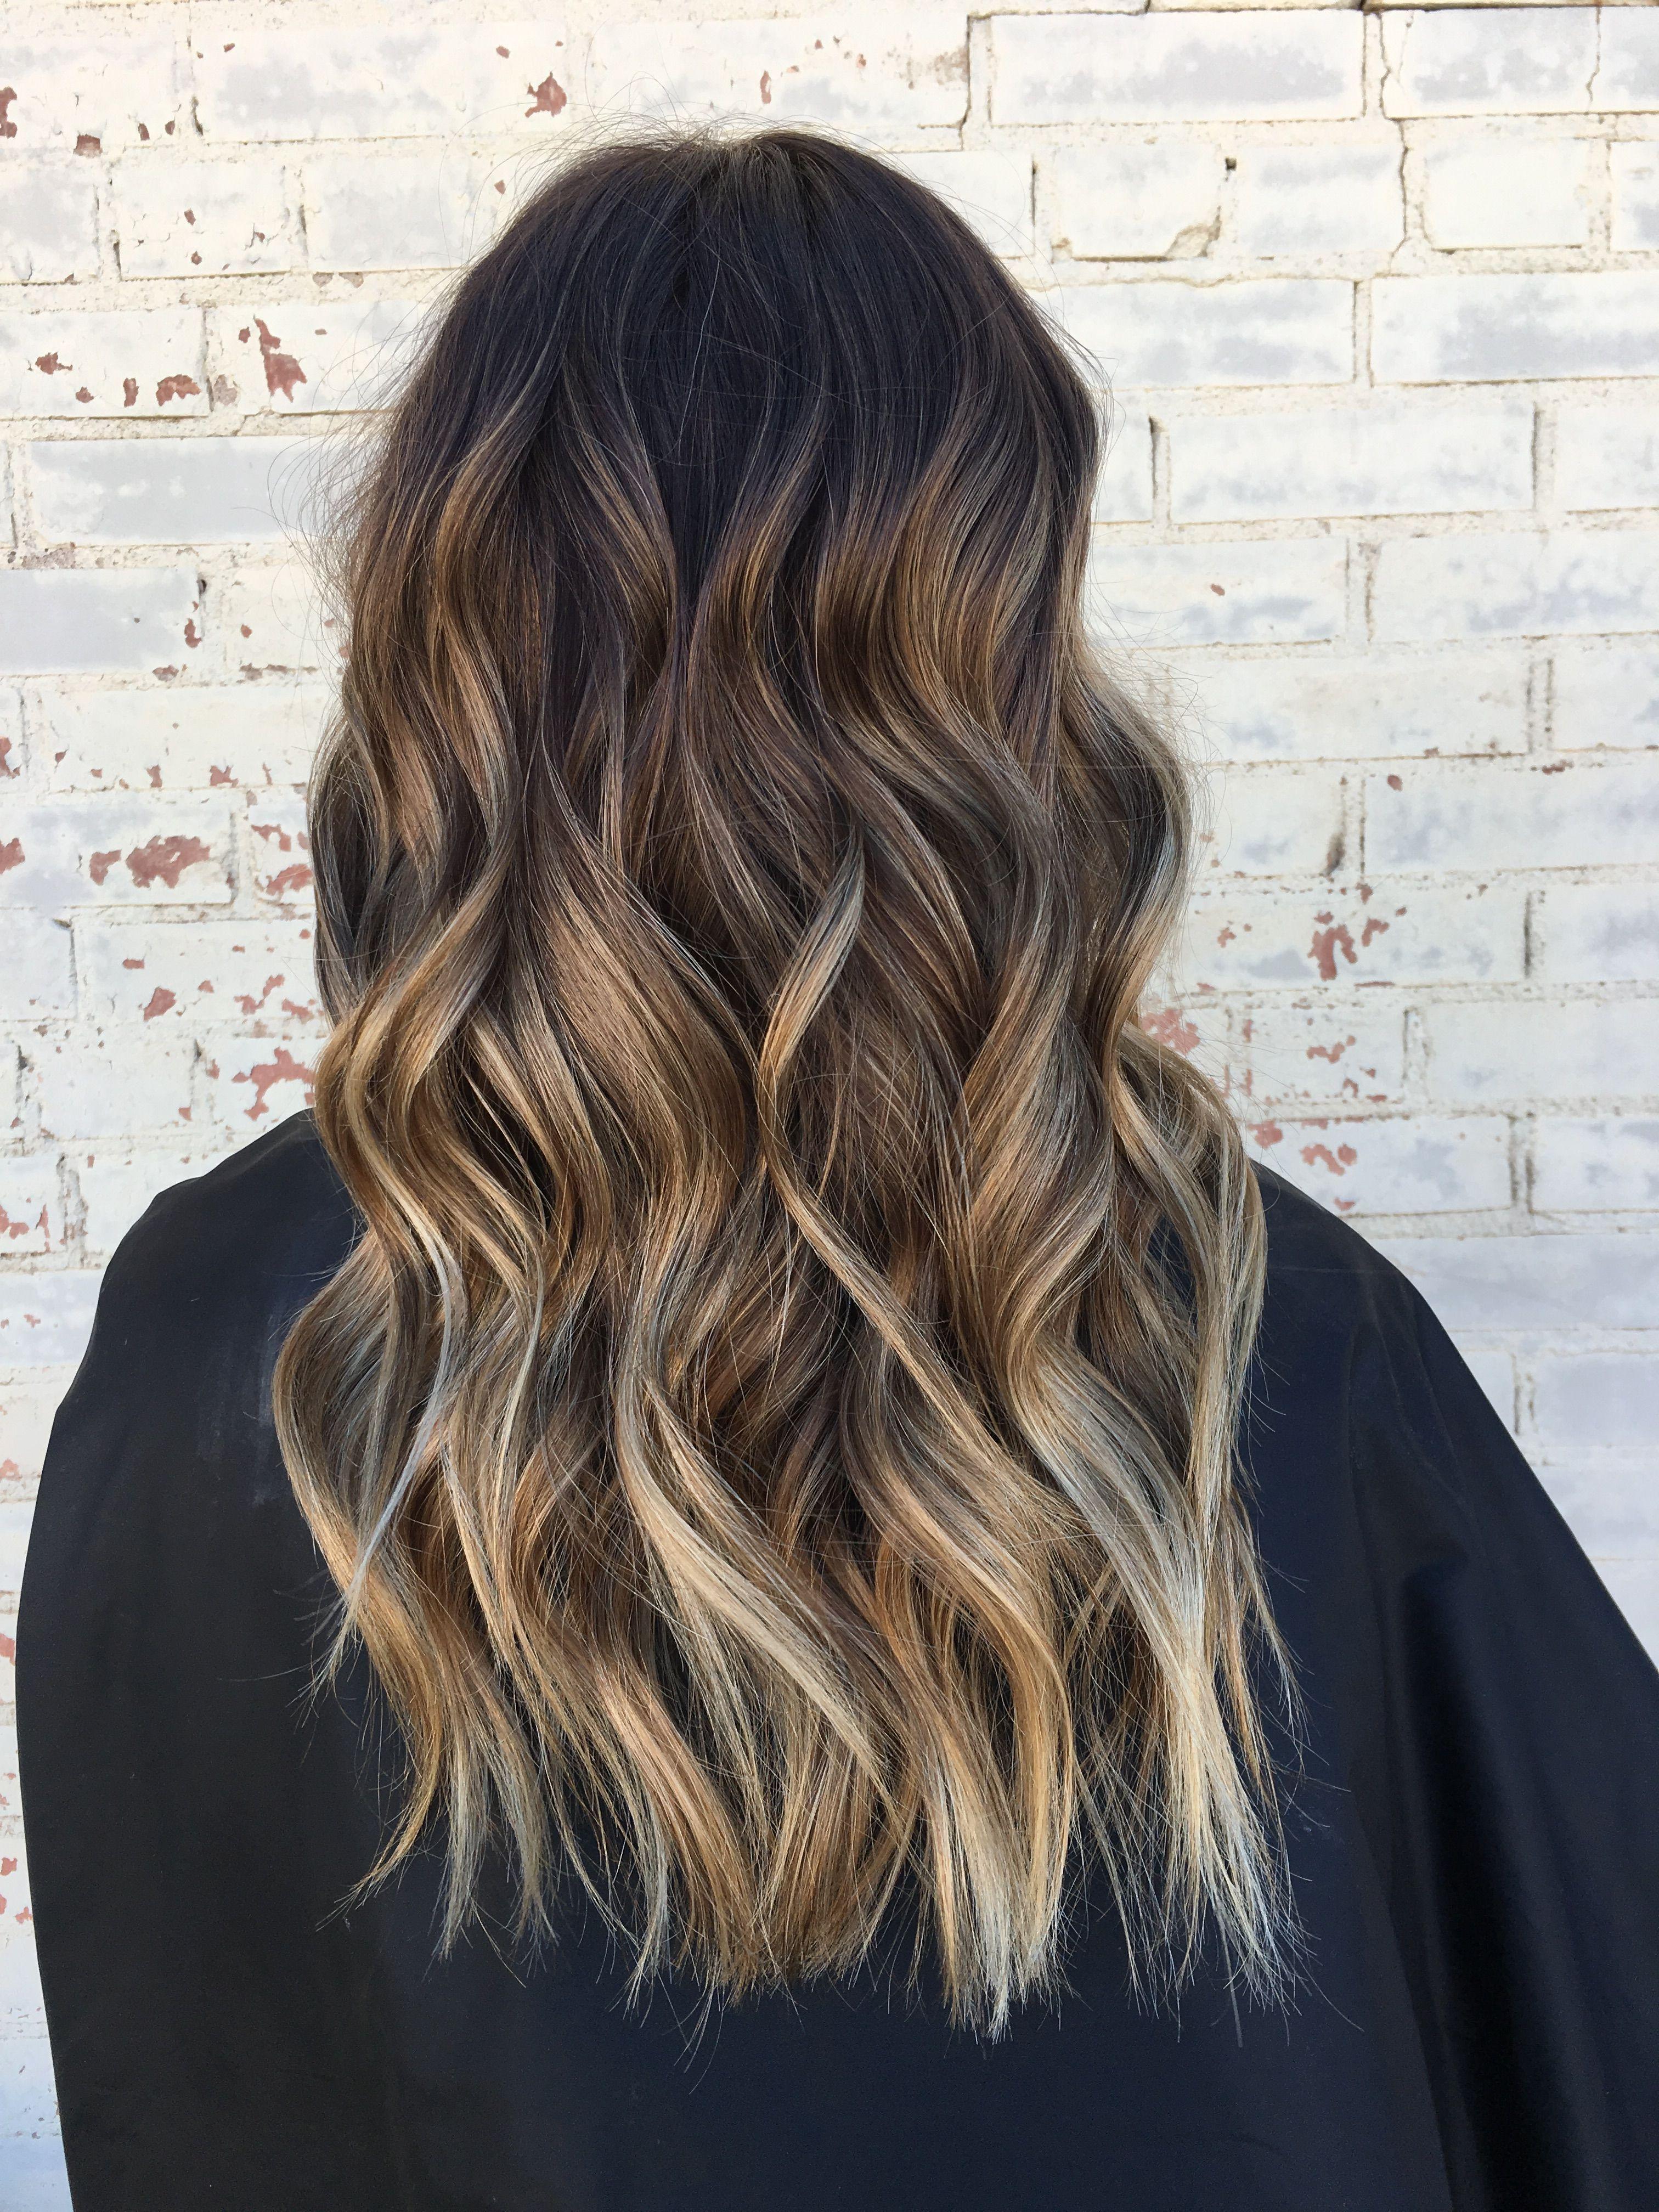 Brown hair brown balayage blonde highlights loose waves hair